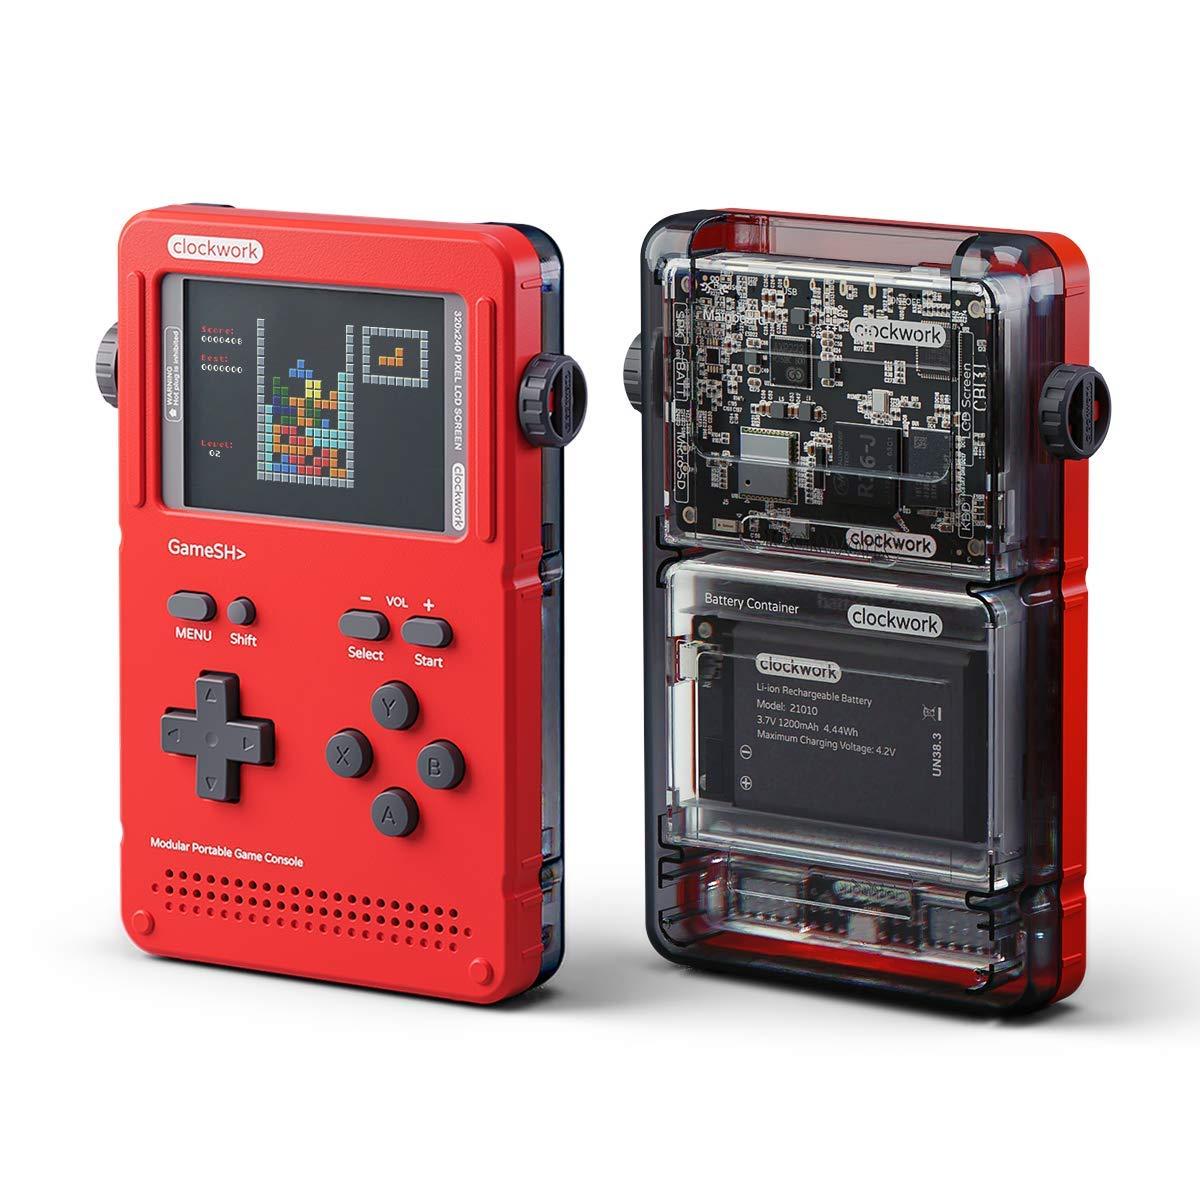 Gameshell เครื่องเกม Retro ยุคใหม่ ออกแบบเป็นโมดูล ถอดเปลี่ยนชิ้นส่วนได้ ต่อขึ้นจอใหญ่ได้ - Gameshell เครื่องเกม Retro ยุคใหม่ ออกแบบเป็นโมดูล ถอดเปลี่ยนชิ้นส่วนได้ ต่อขึ้นจอใหญ่ได้